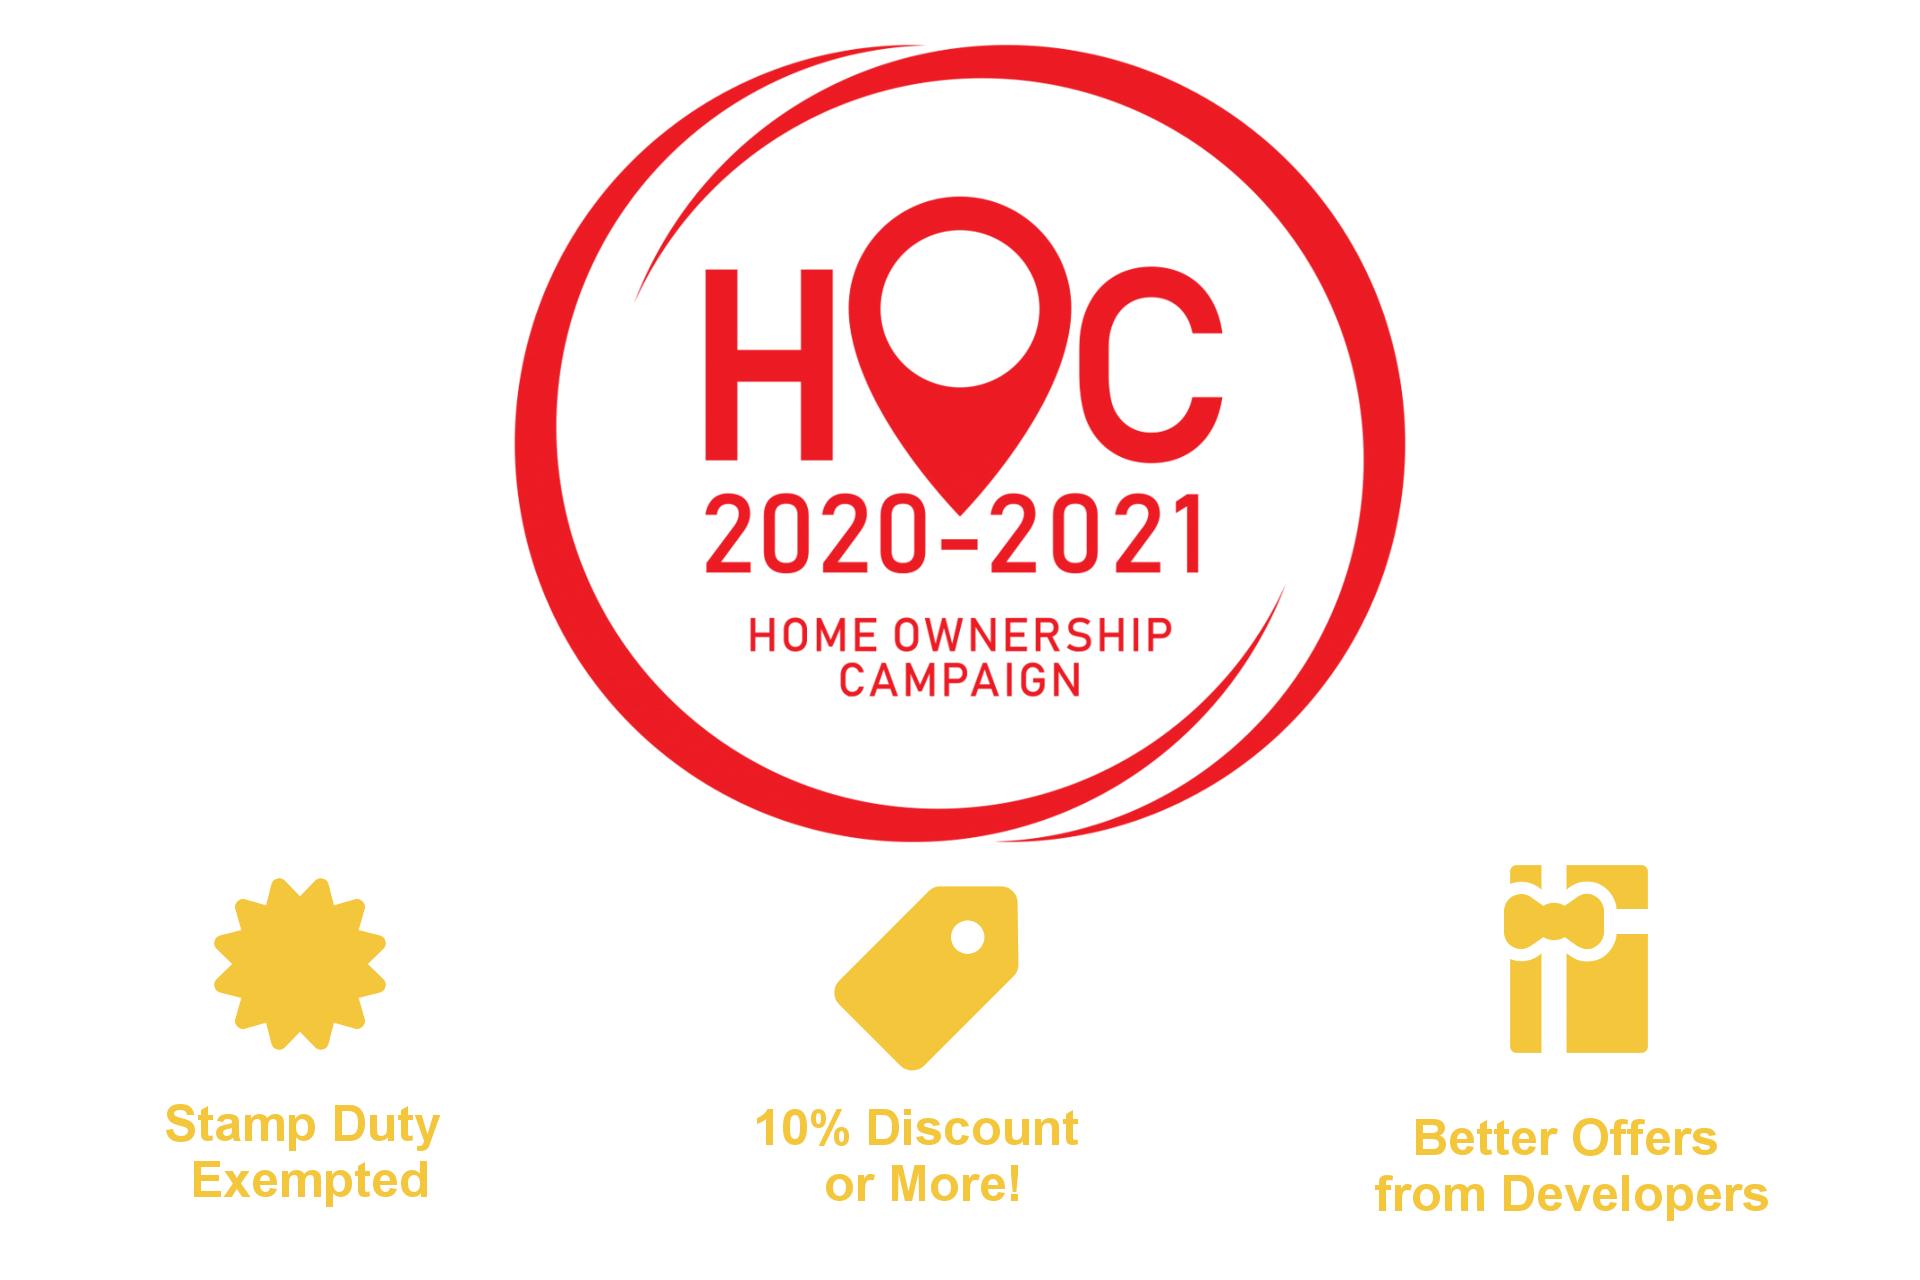 HOC 2020-2021 Malaysia